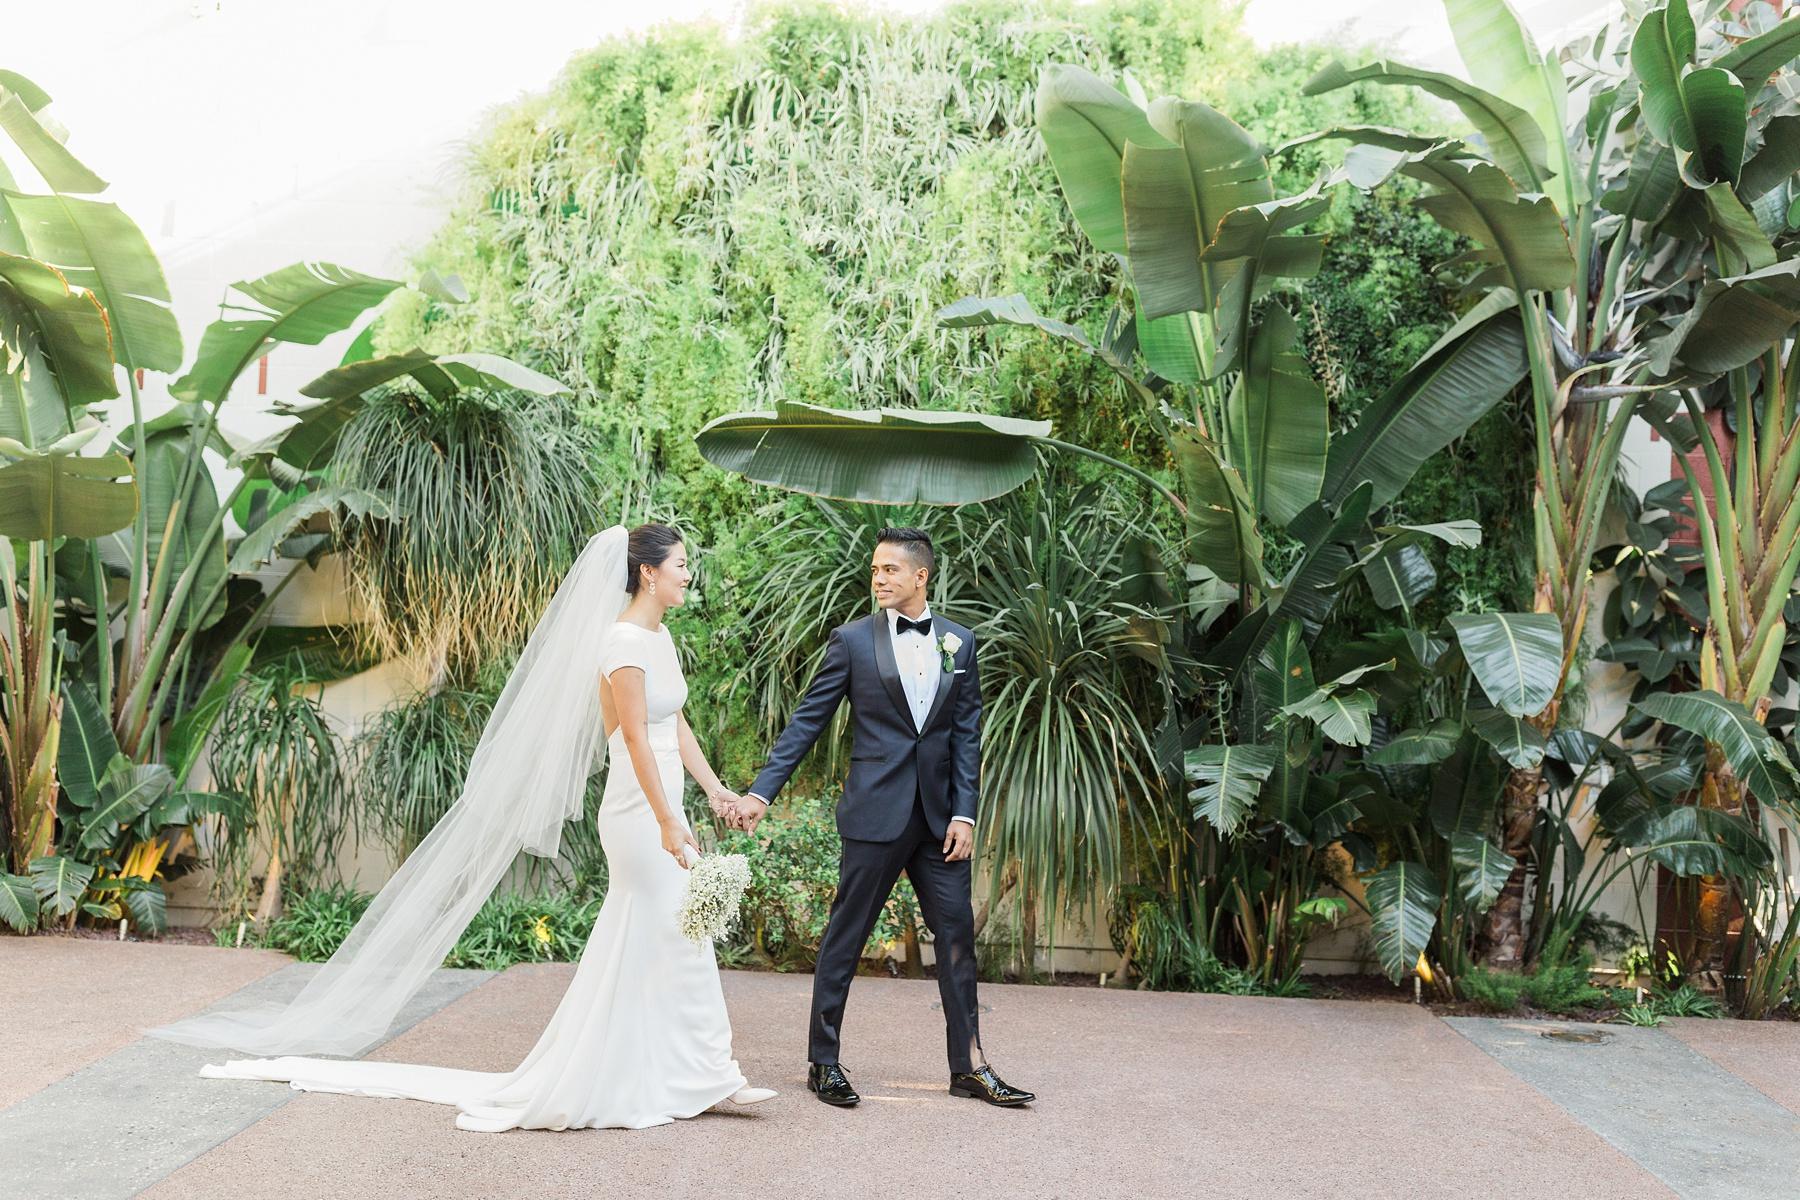 Urban DTLA Wedding at Millwick By Wedding Photographer Madison Ellis (17)